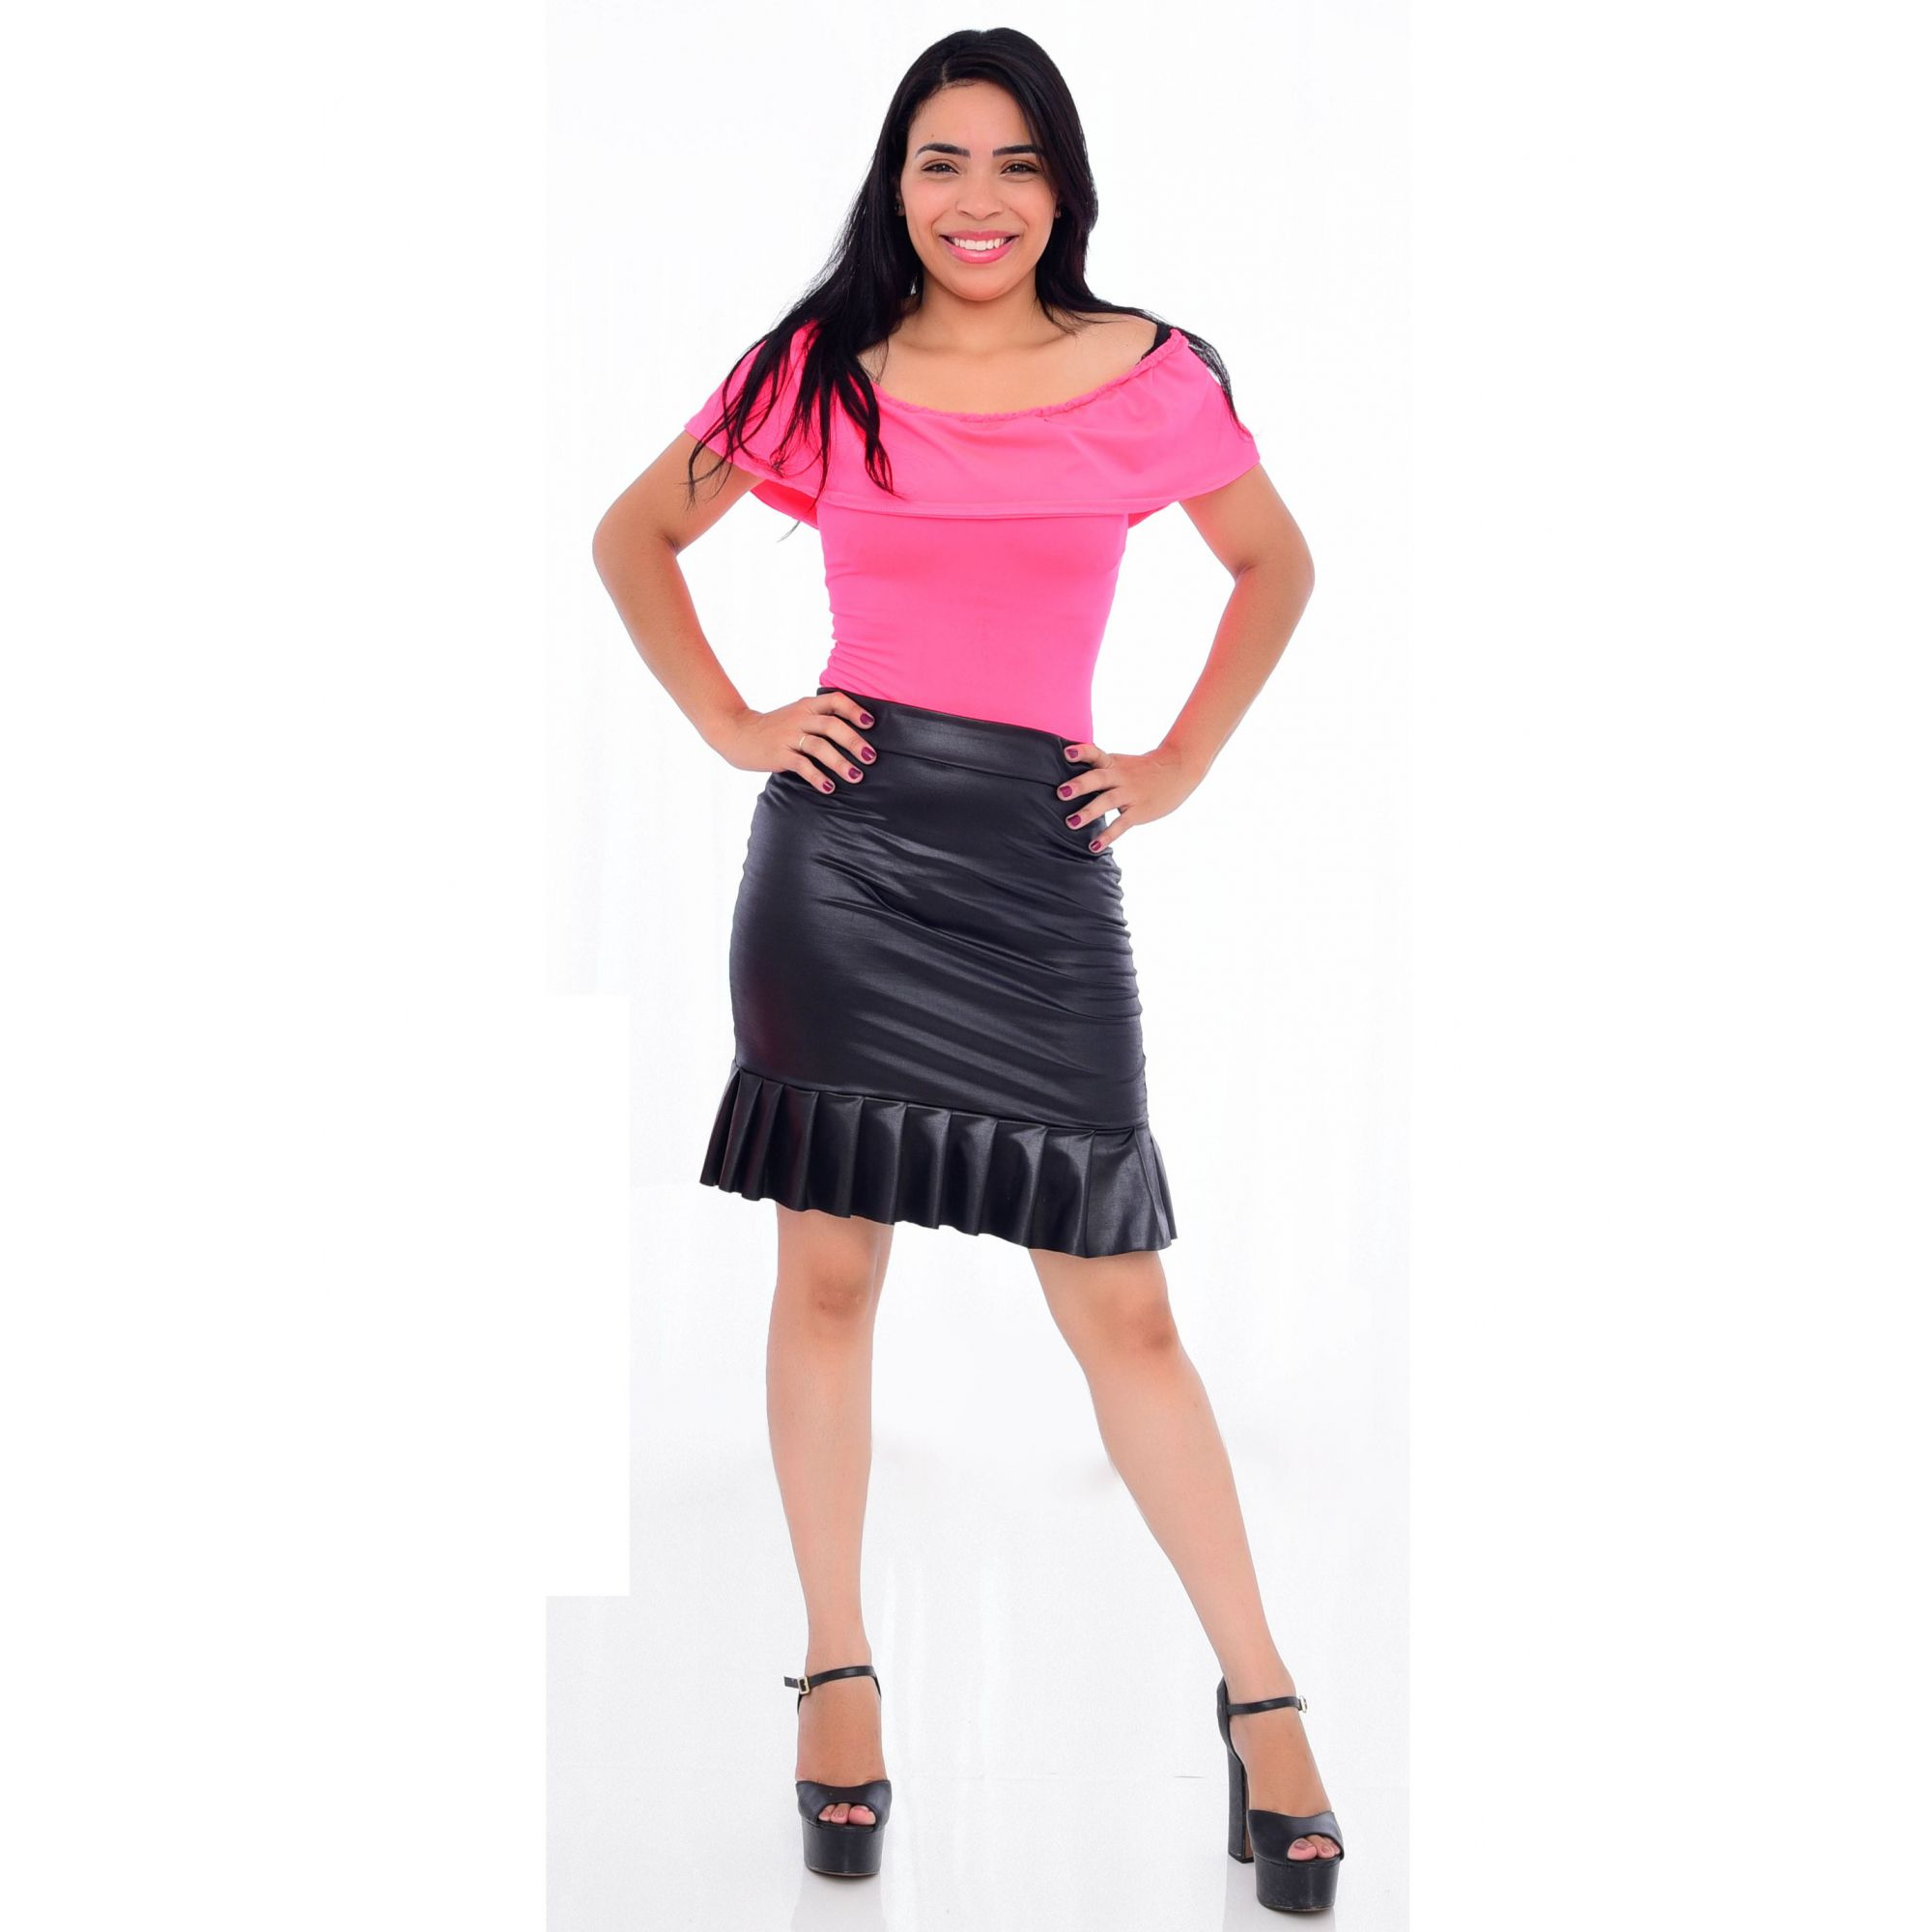 Mãe e Filha > Kit 02 Bodys Femininos Neon Rosa  [Coleção Tal Mãe Tal Filha]  - Heitor Fashion Brazil